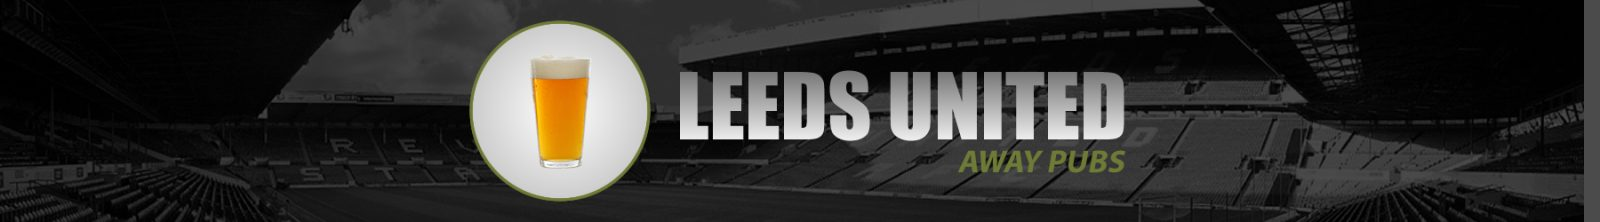 Leeds United Away Pubs